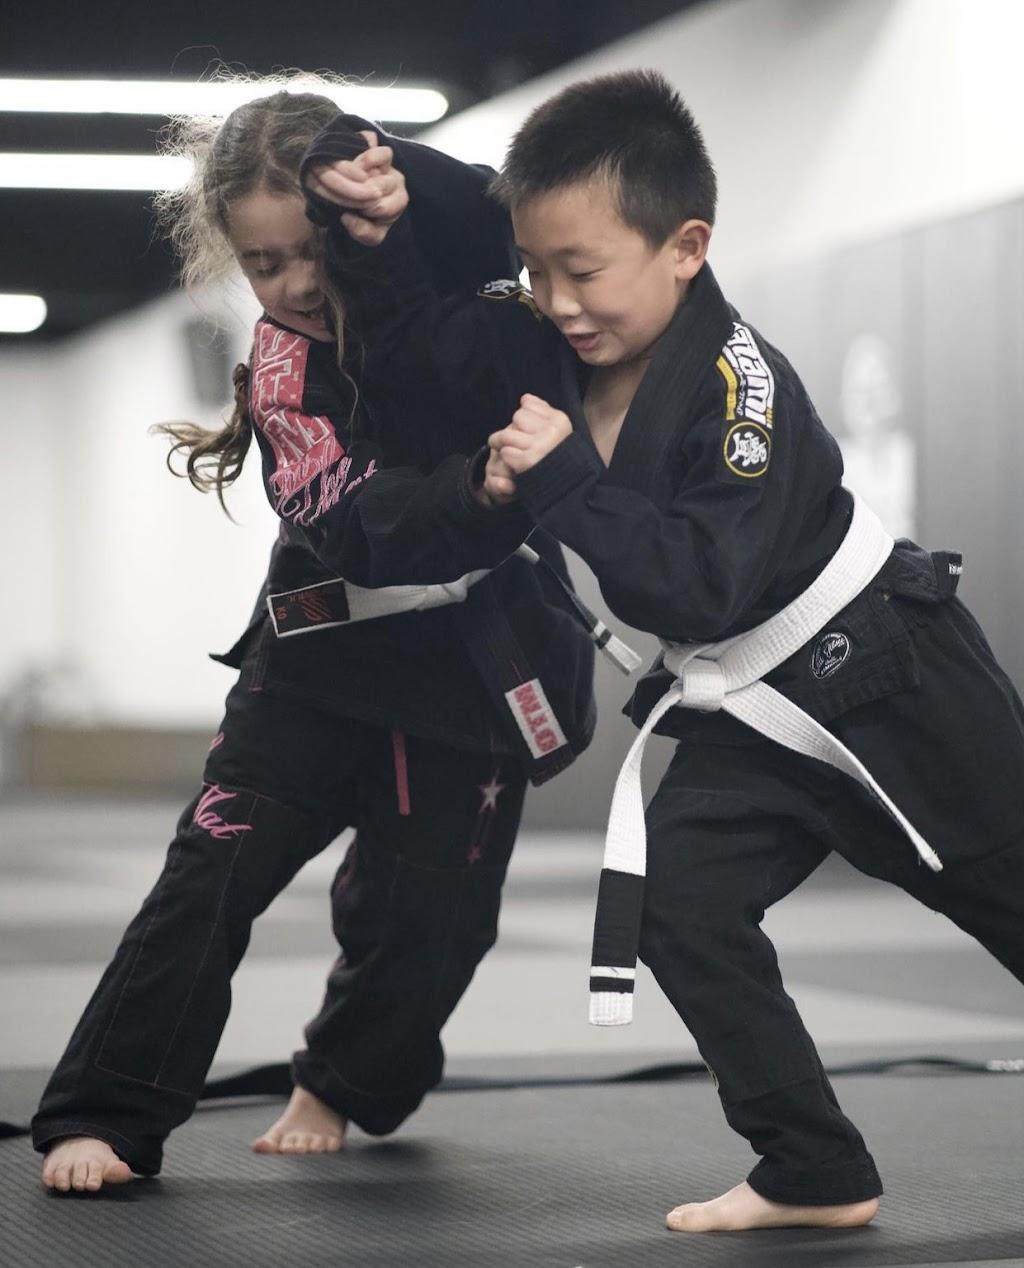 Logic Jiu Jitsu, Muay Thai, & Martial Arts - health  | Photo 2 of 10 | Address: 1360 N American St, Philadelphia, PA 19122, USA | Phone: (215) 593-0060